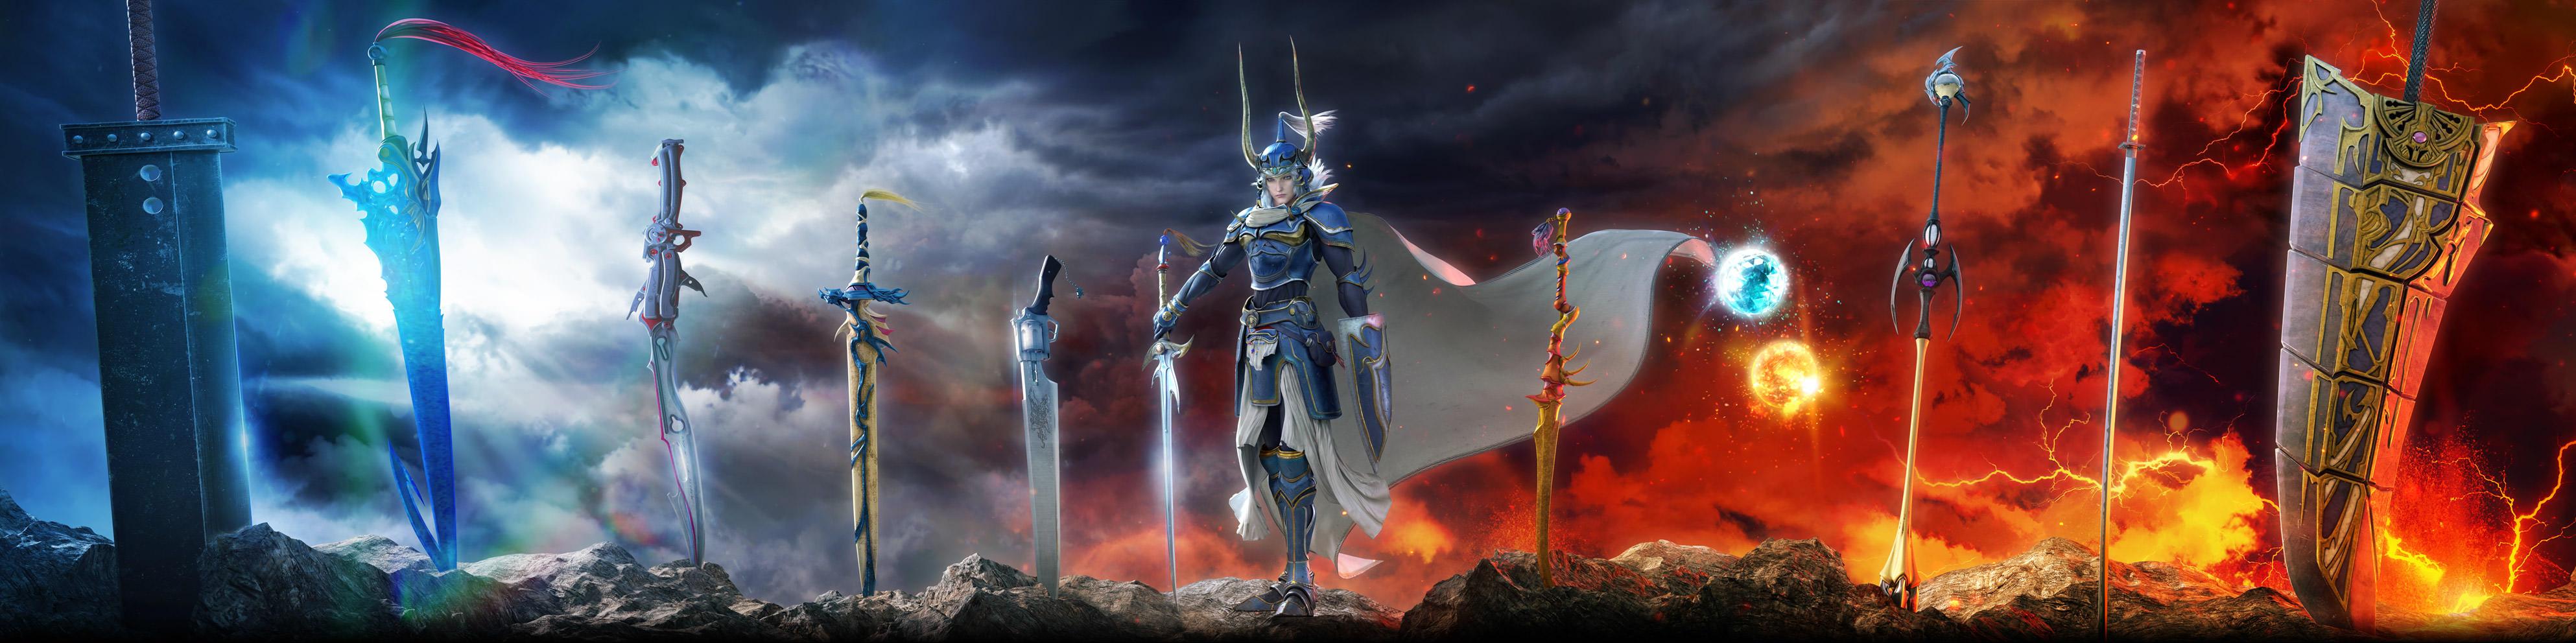 Dissidia Final Fantasy Nt Square Enix